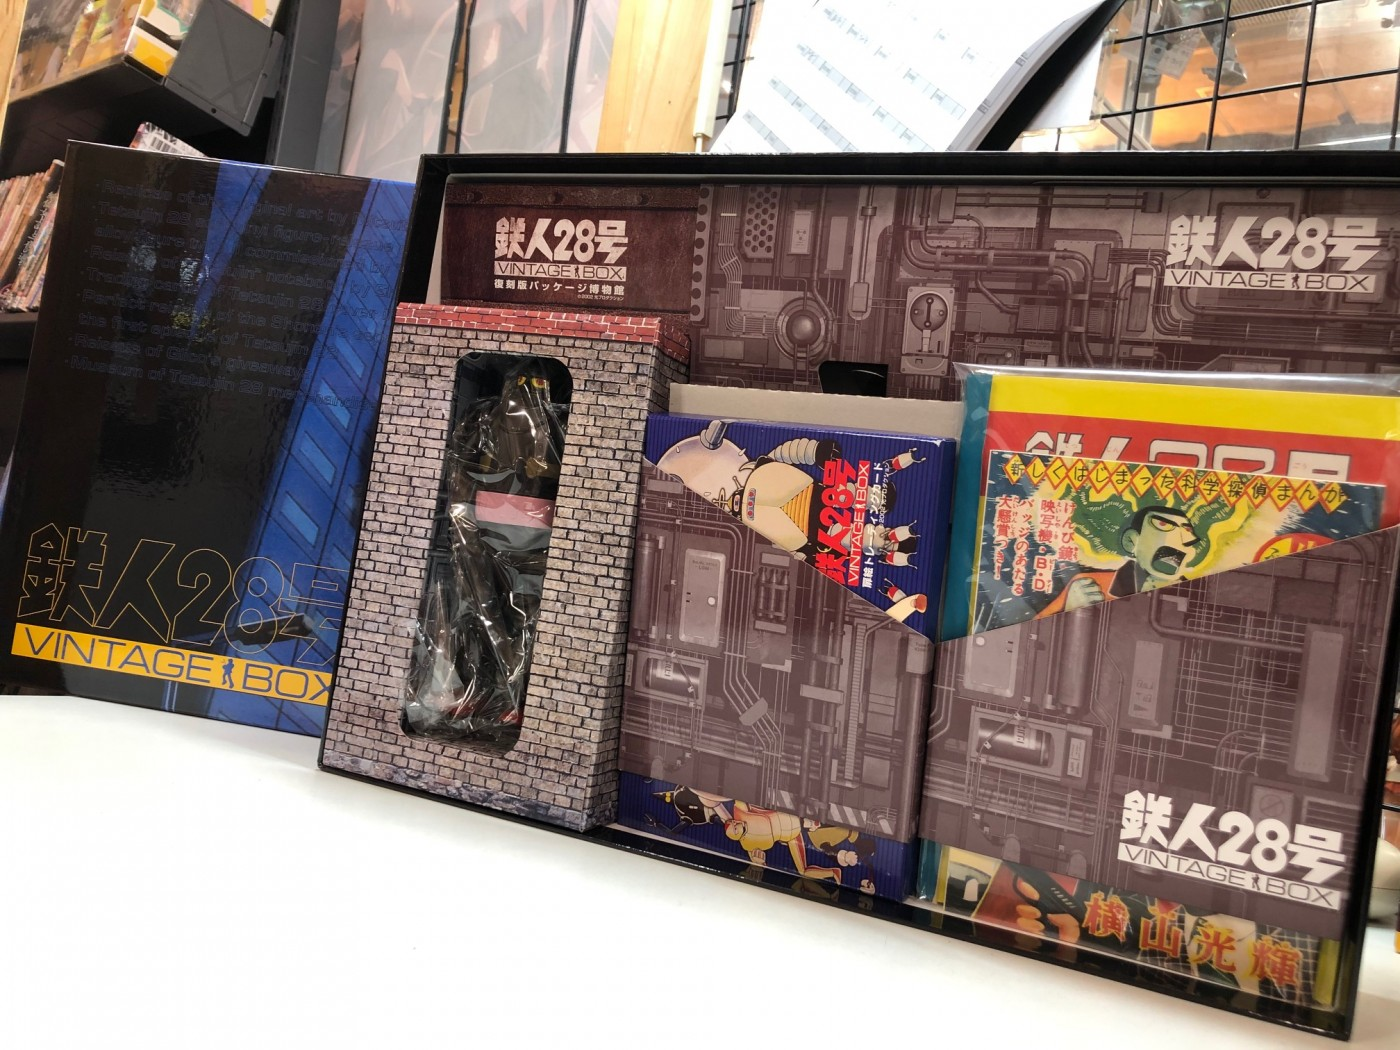 買取情報『講談社の鉄人28号 VINTAGE BOX』